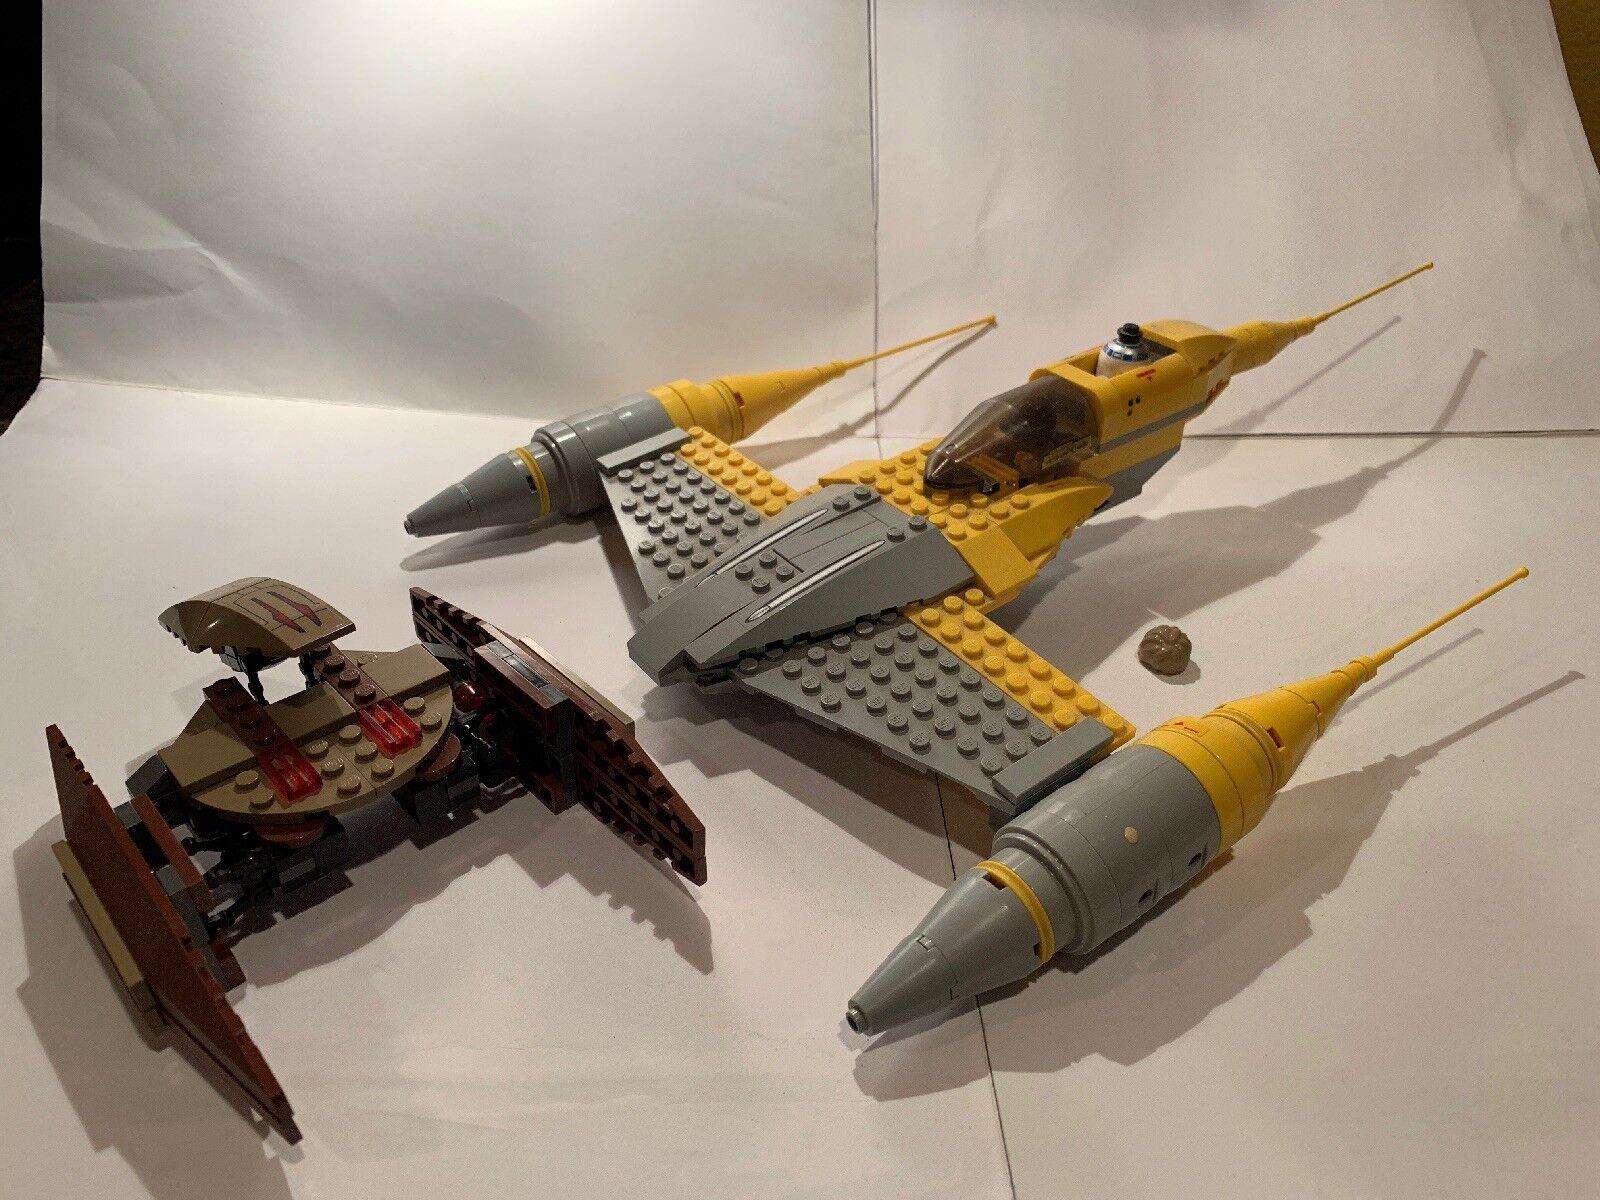 LEGO Star Wars Naboo N-1 Starfighter And Vulcher Droid 7660